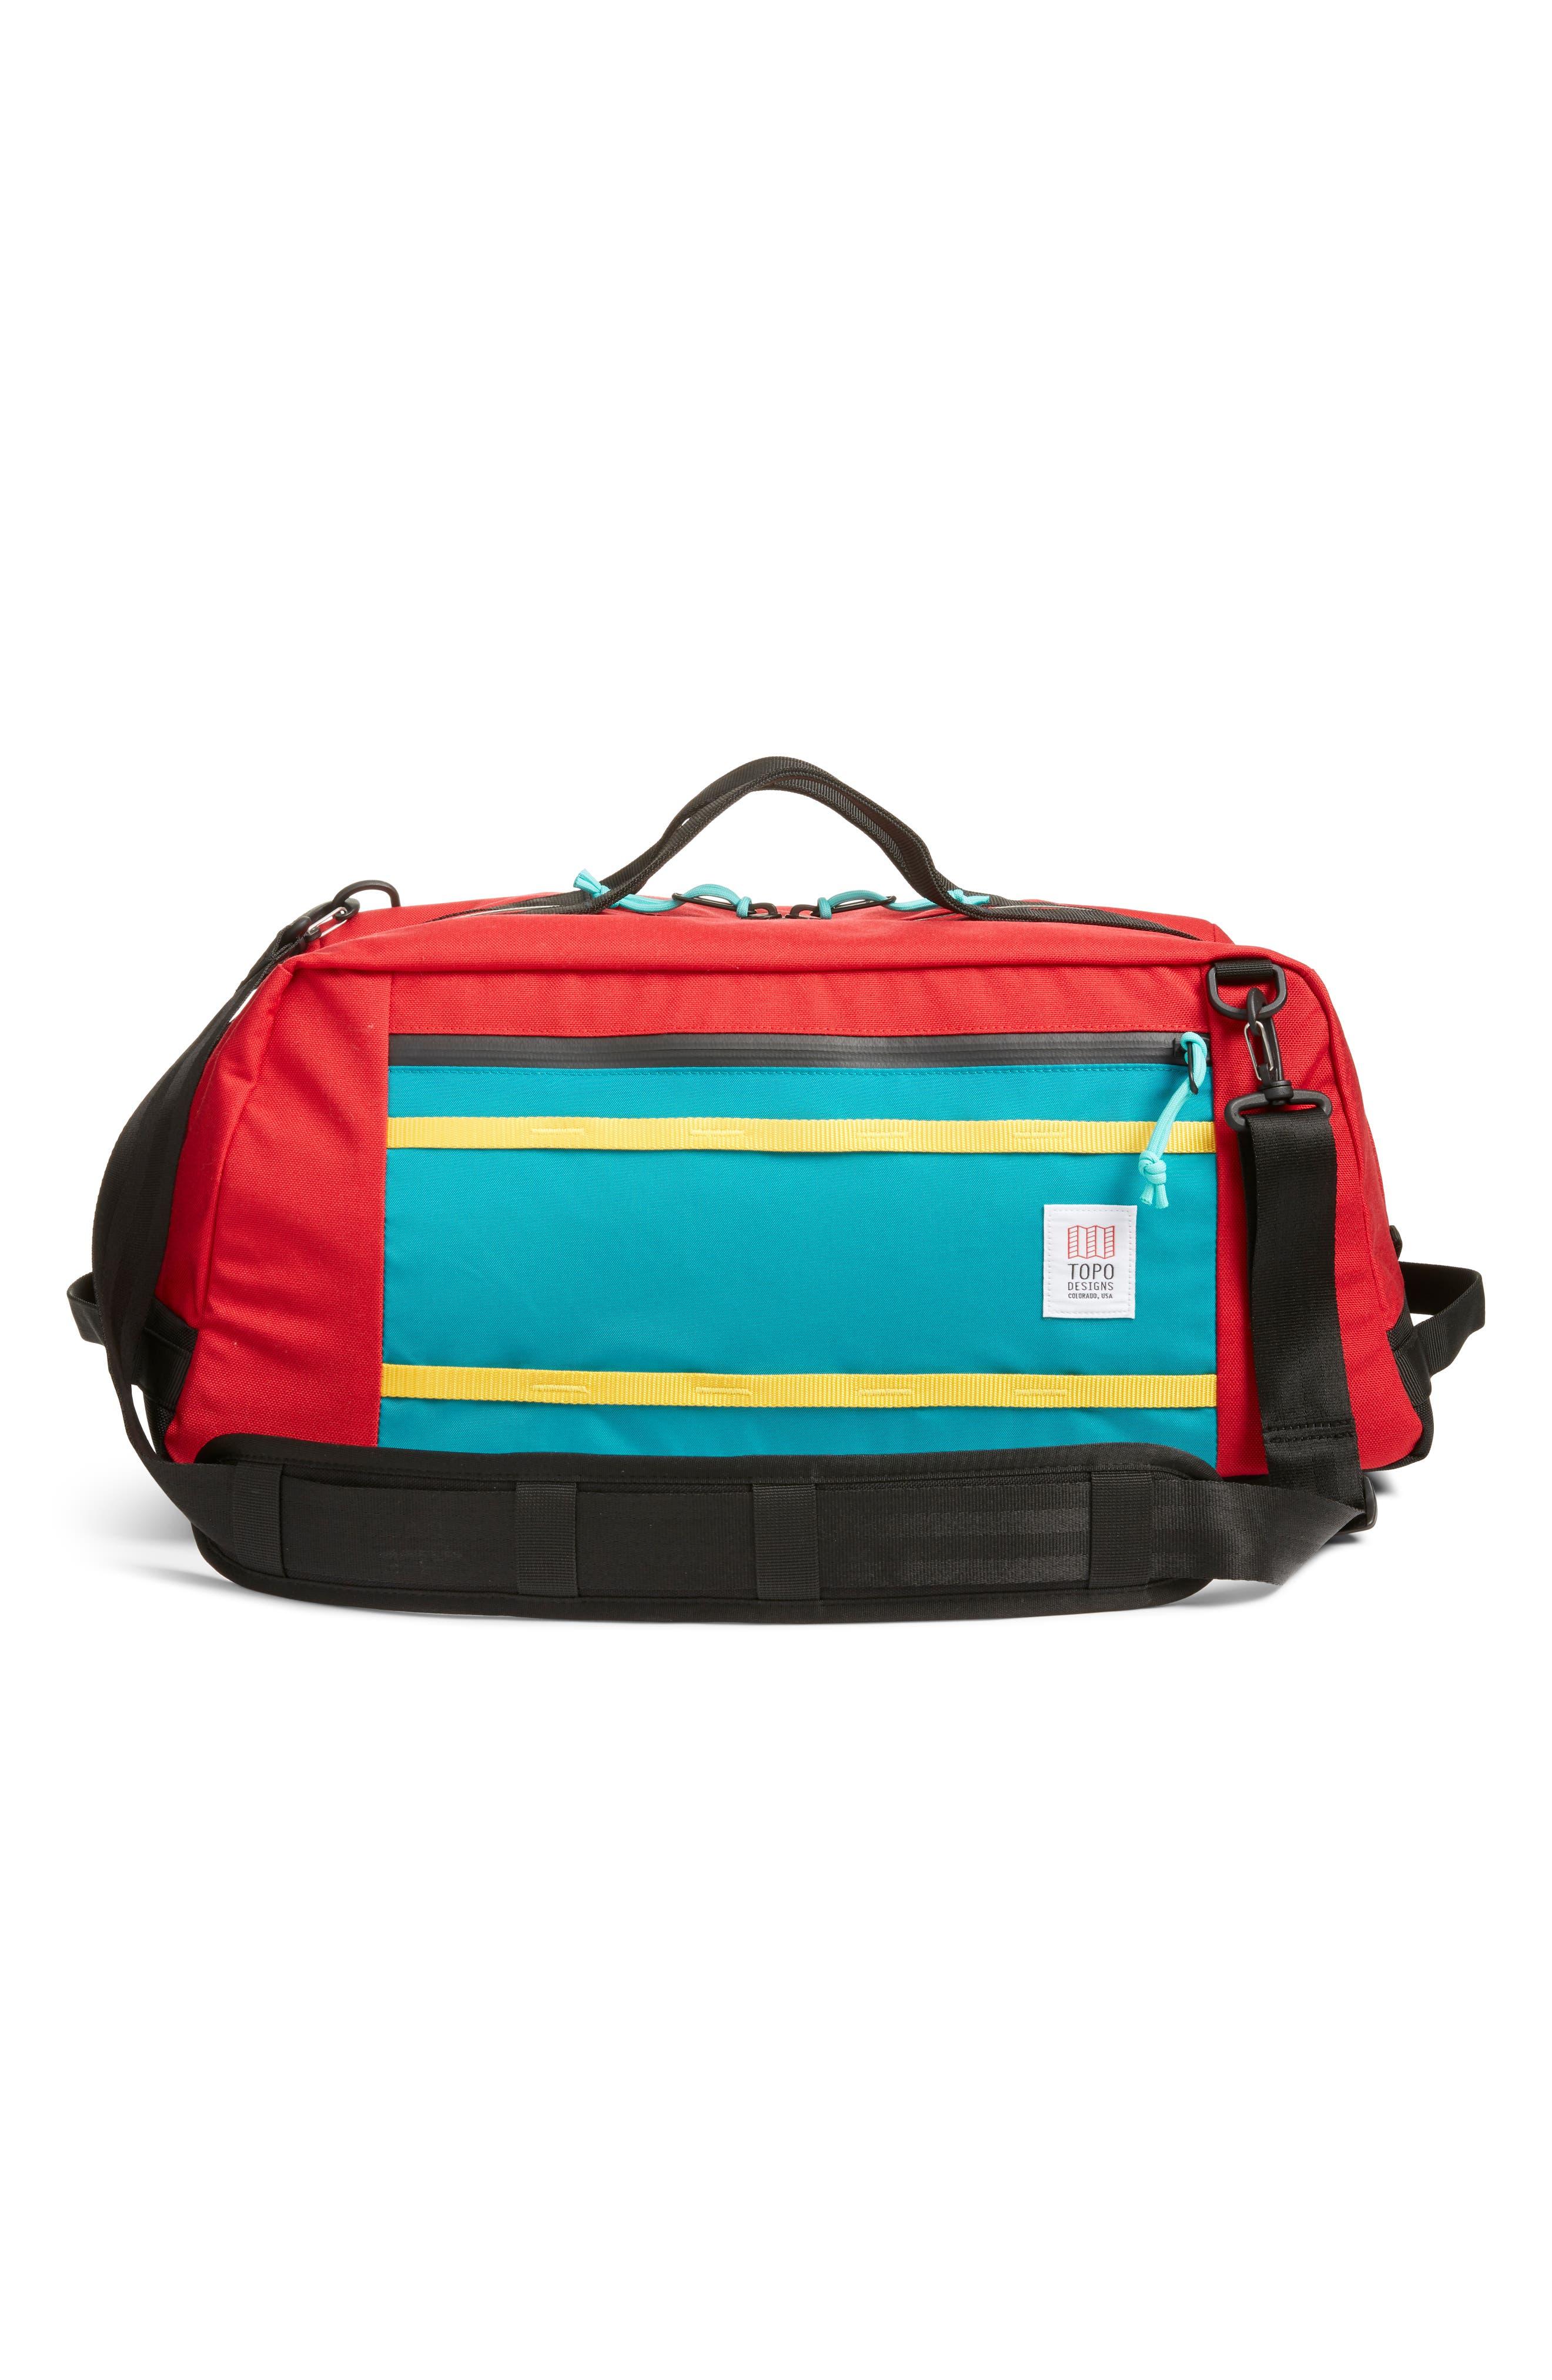 Mountain 40L Convertible Duffel Bag,                             Alternate thumbnail 3, color,                             600